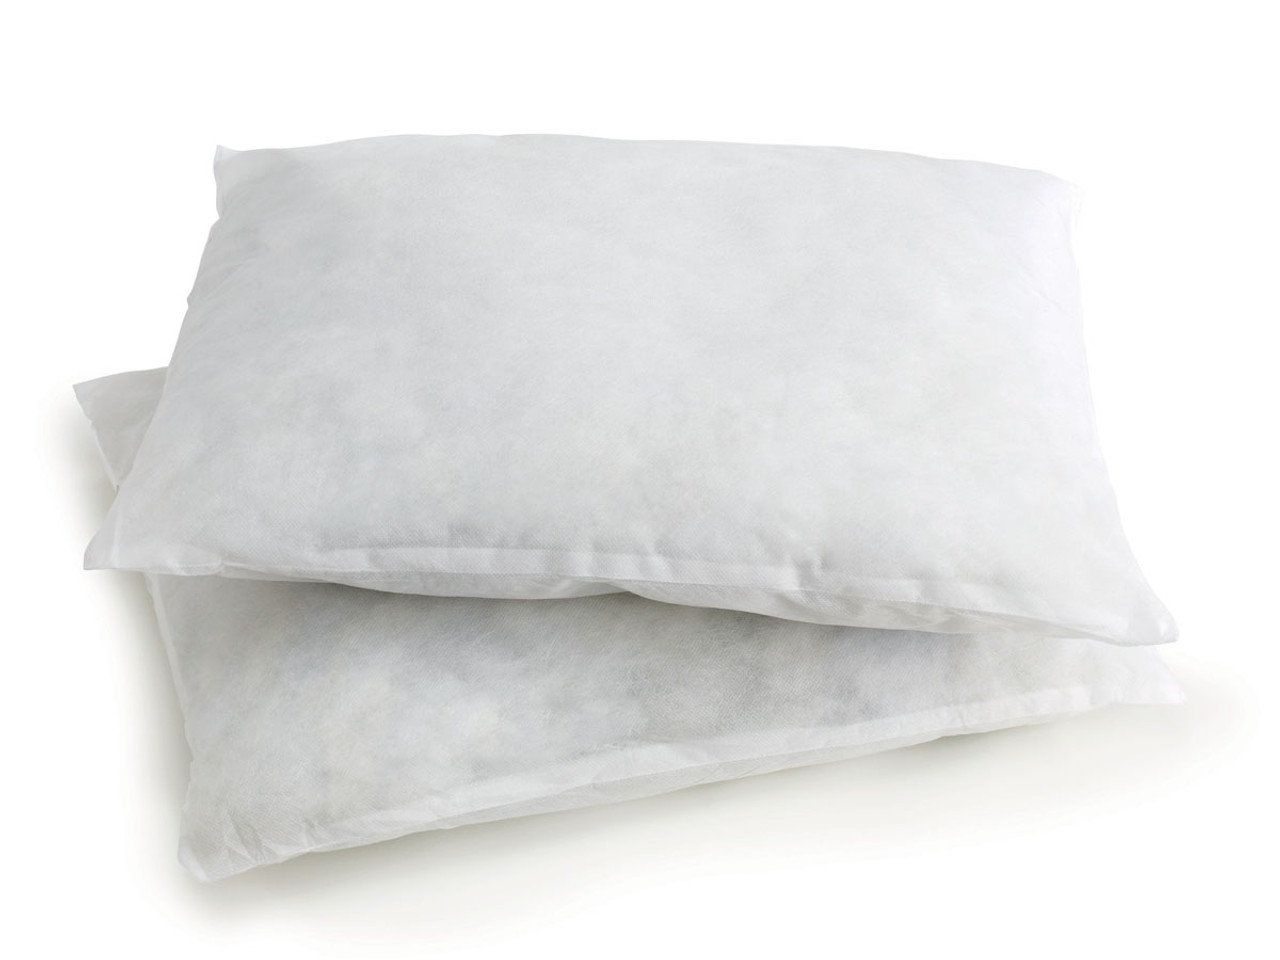 Disposable Cot Pillow - Large Size 17'' x  22''